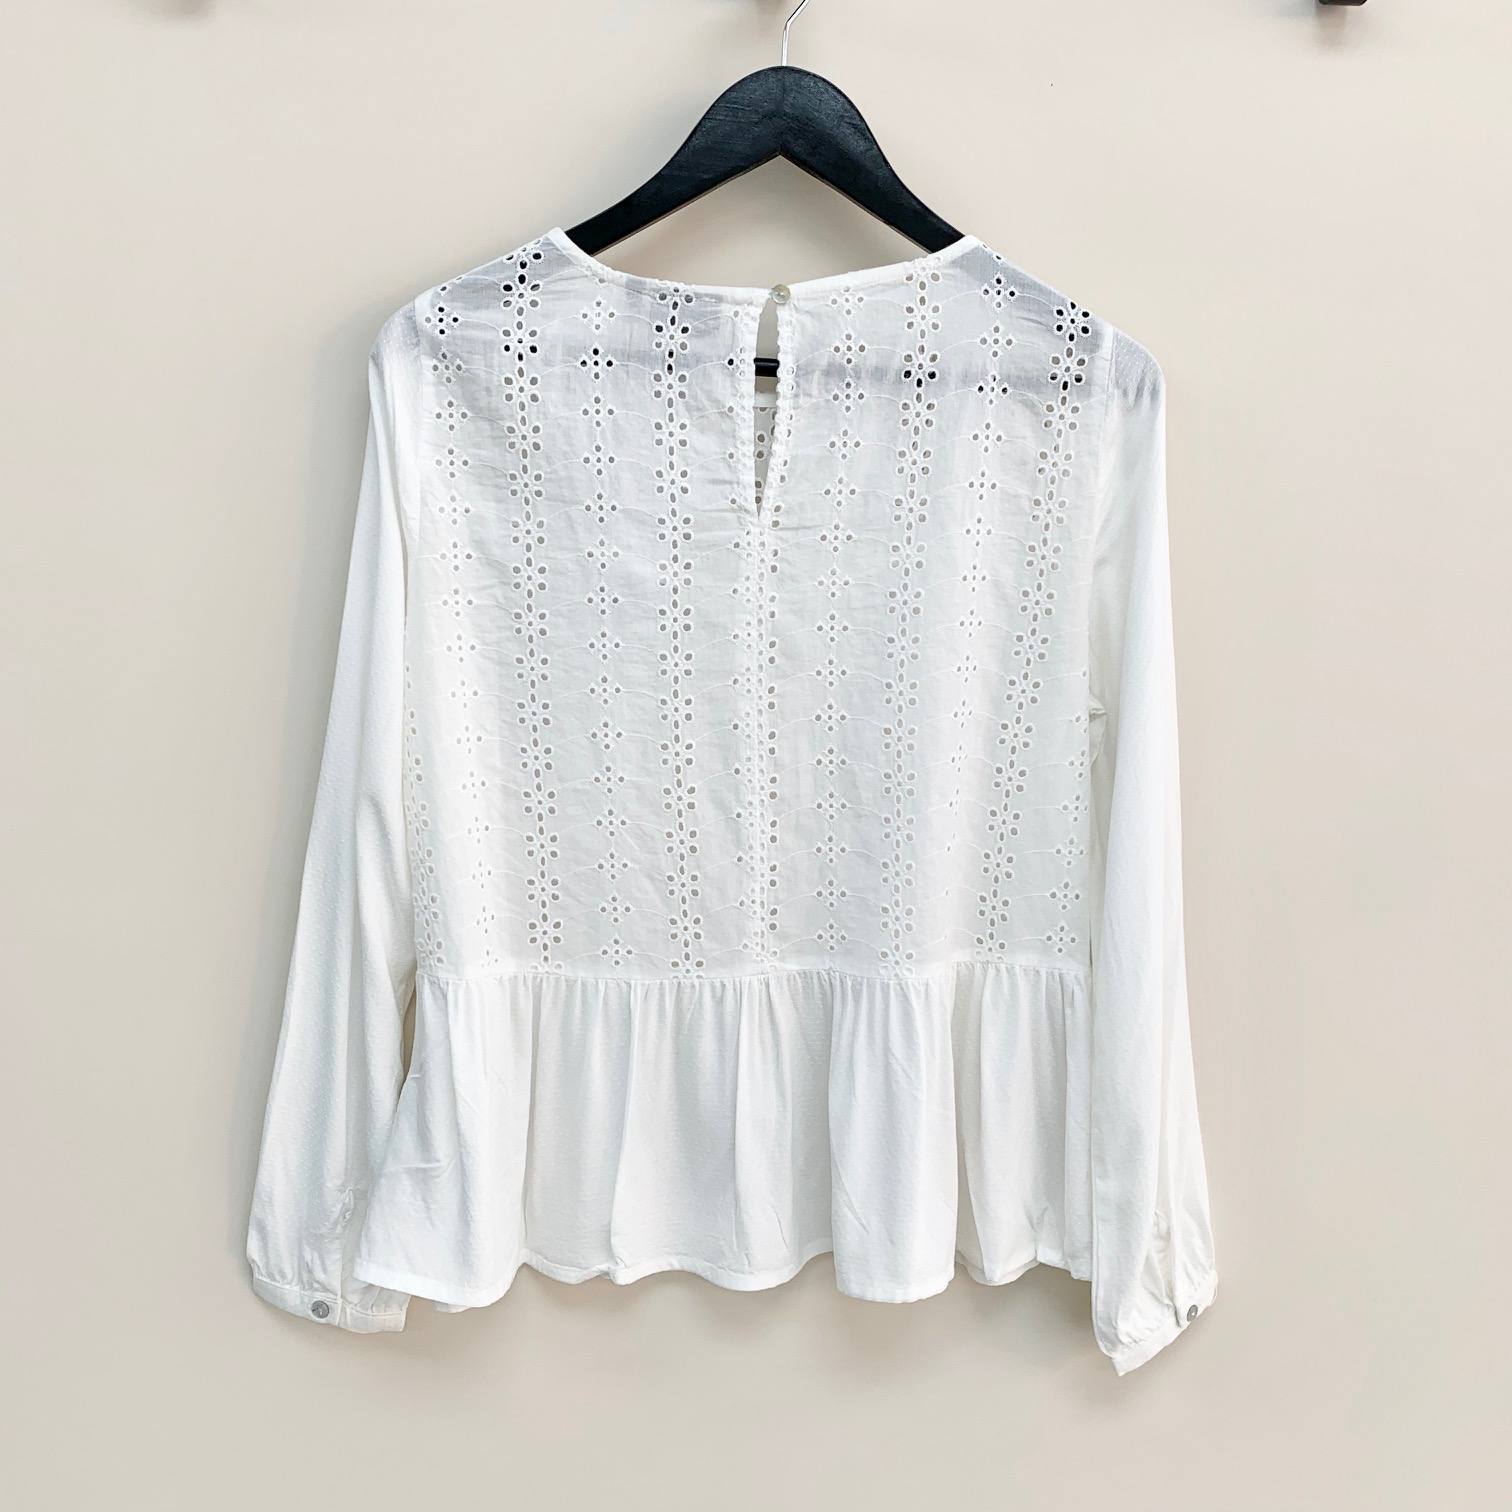 SALE Ivonne frill blouse